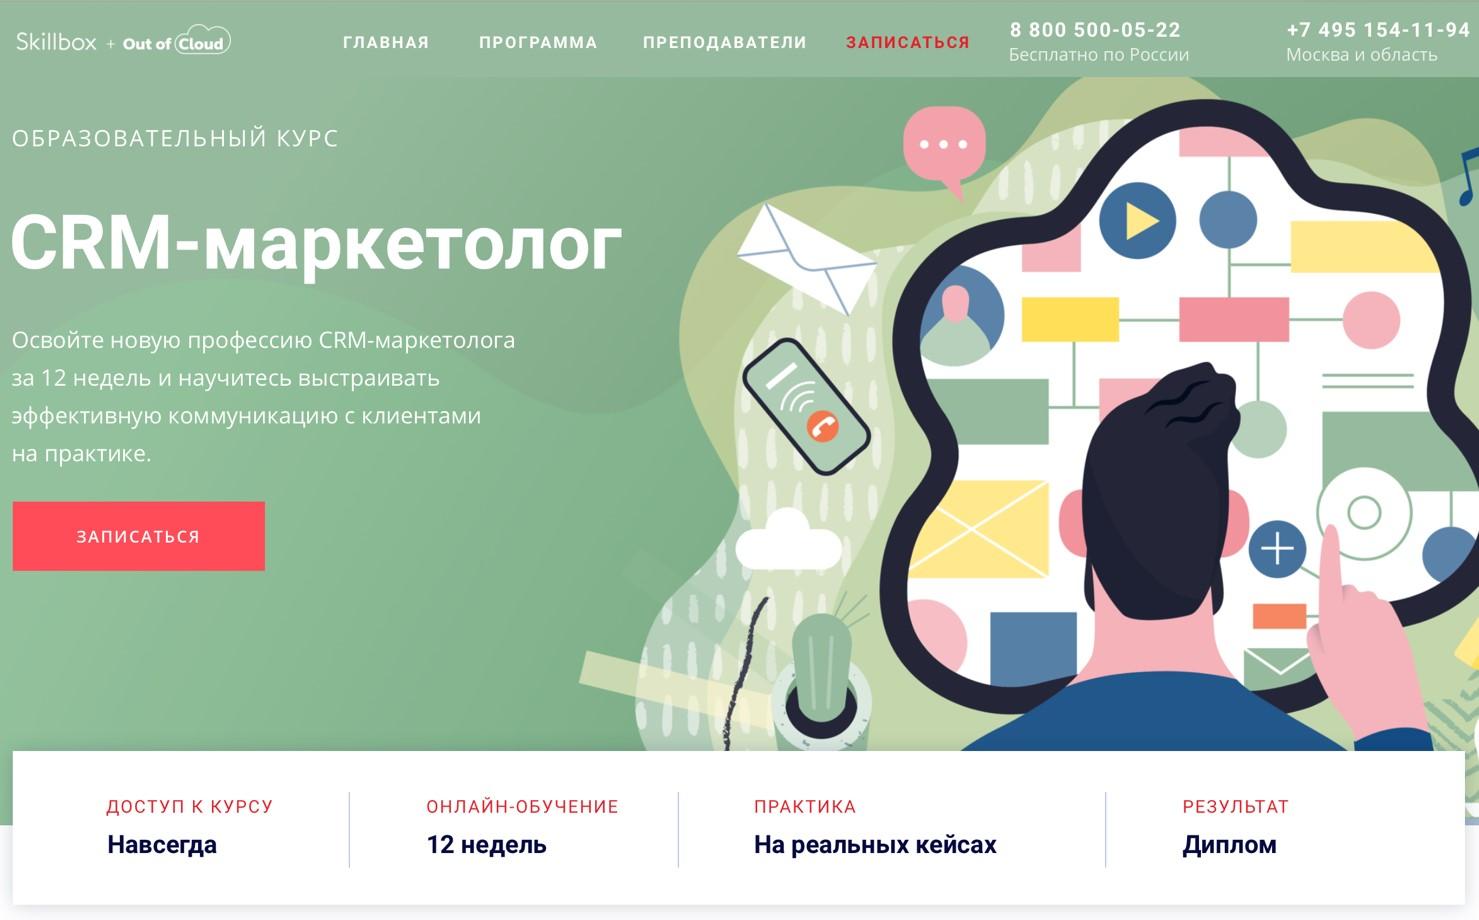 Образовательный онлайн-курс «CRM-маркетолог»